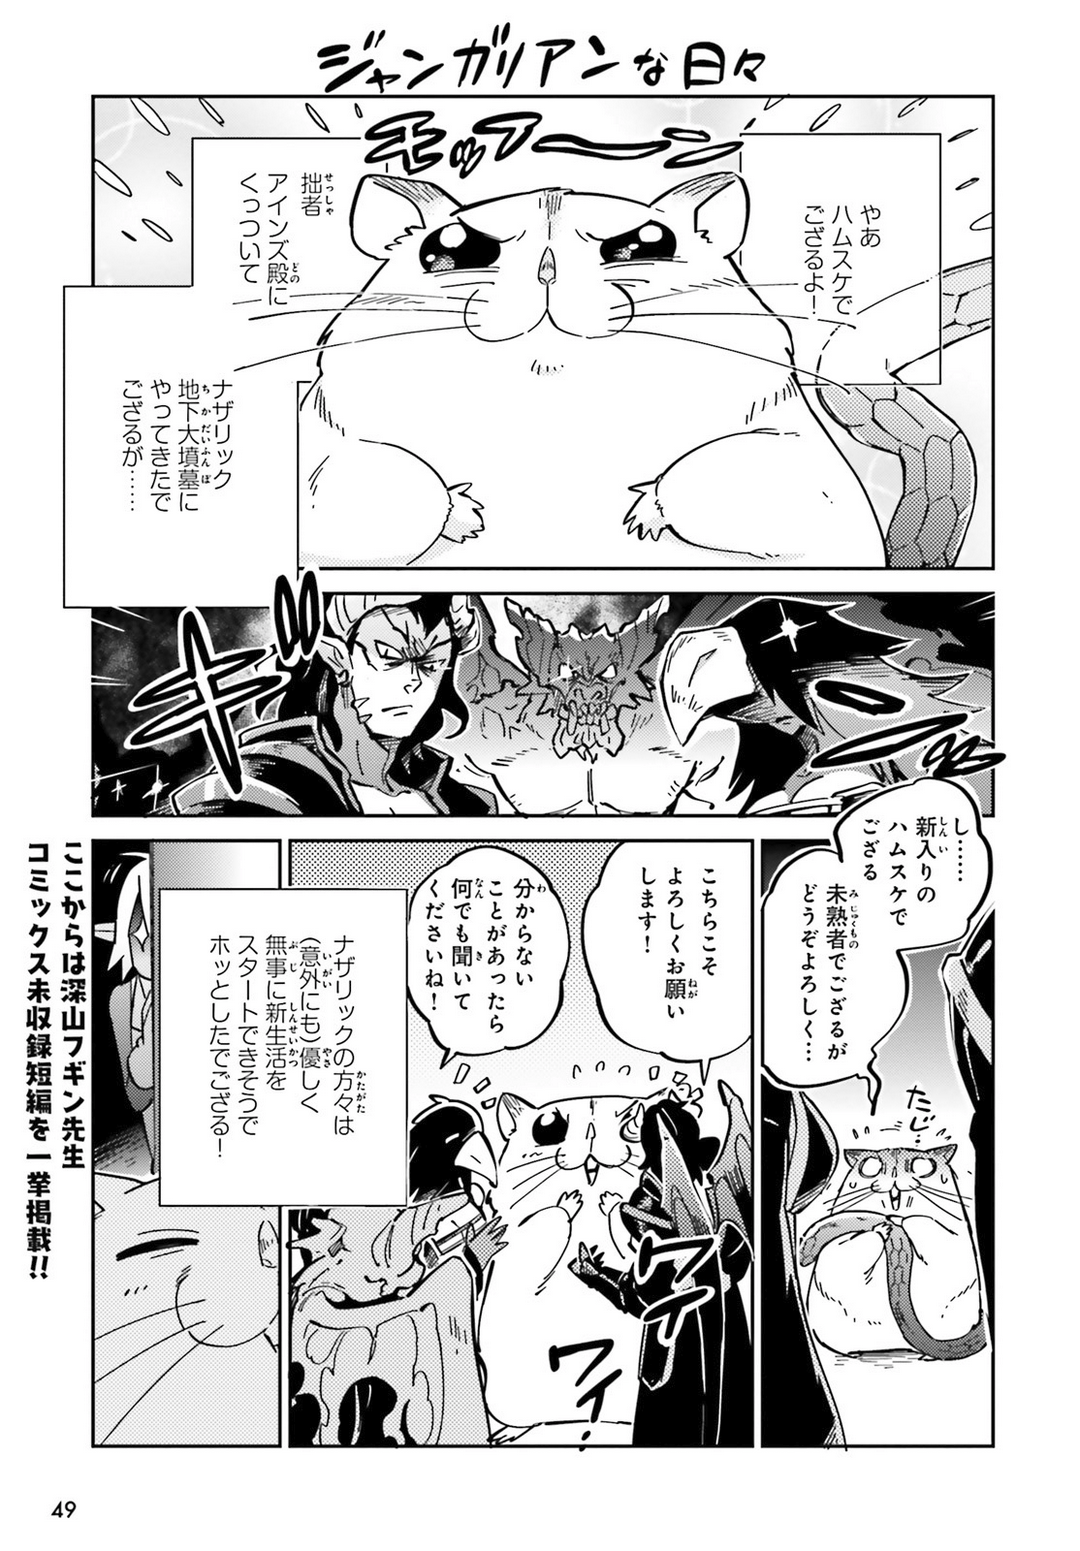 Overlord Blu-ray 04 Manga Special